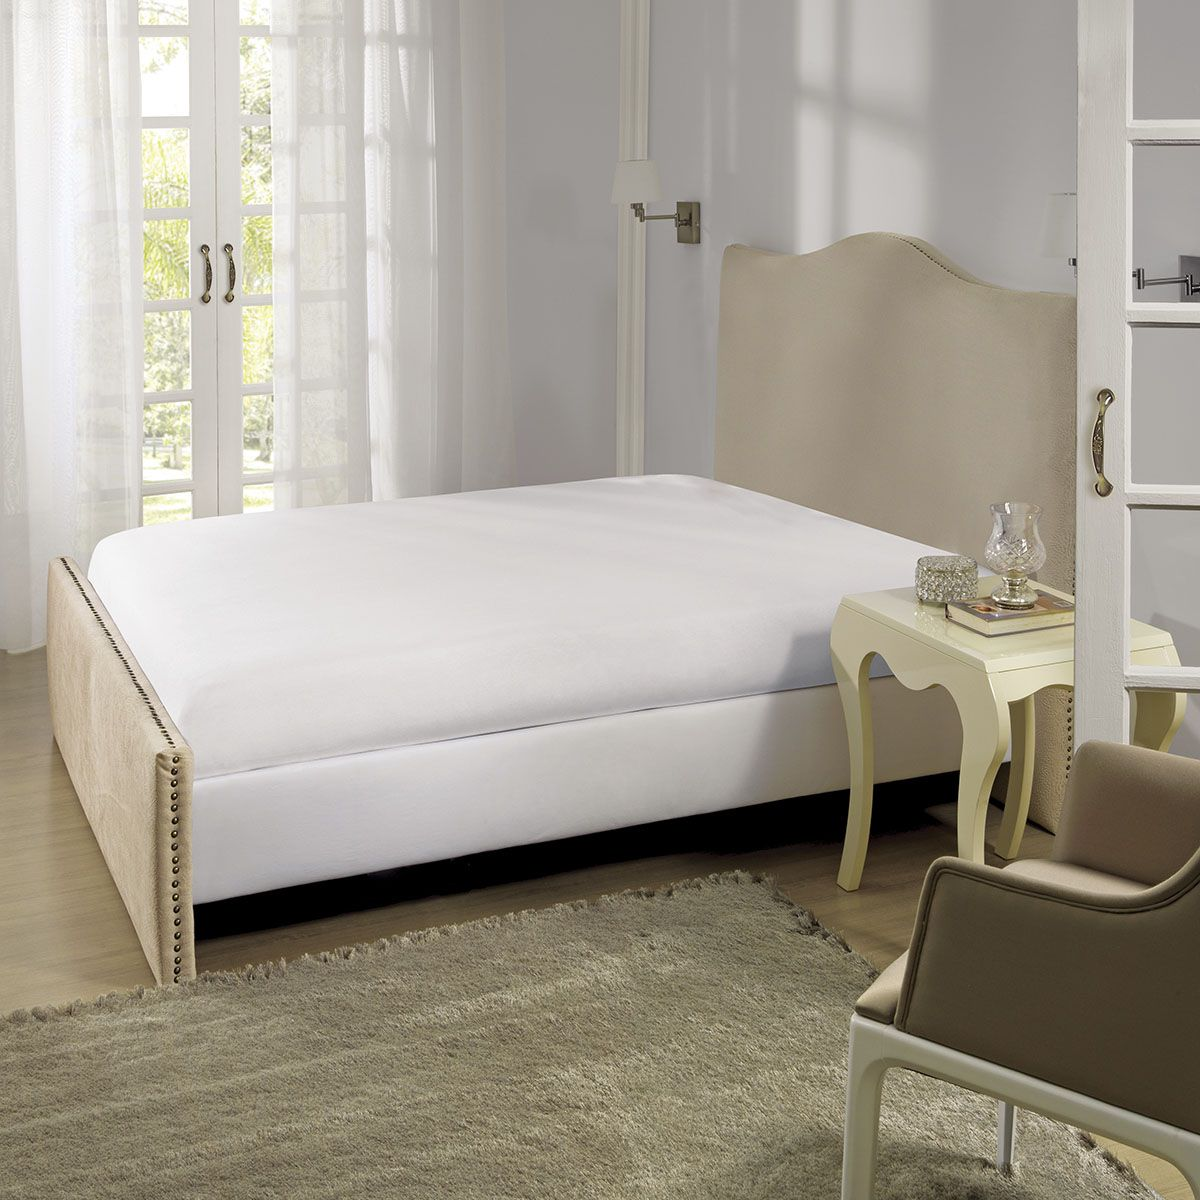 Lençol Branco Premium com elástico 200 fios Queen Size Percal 067448 Lepper